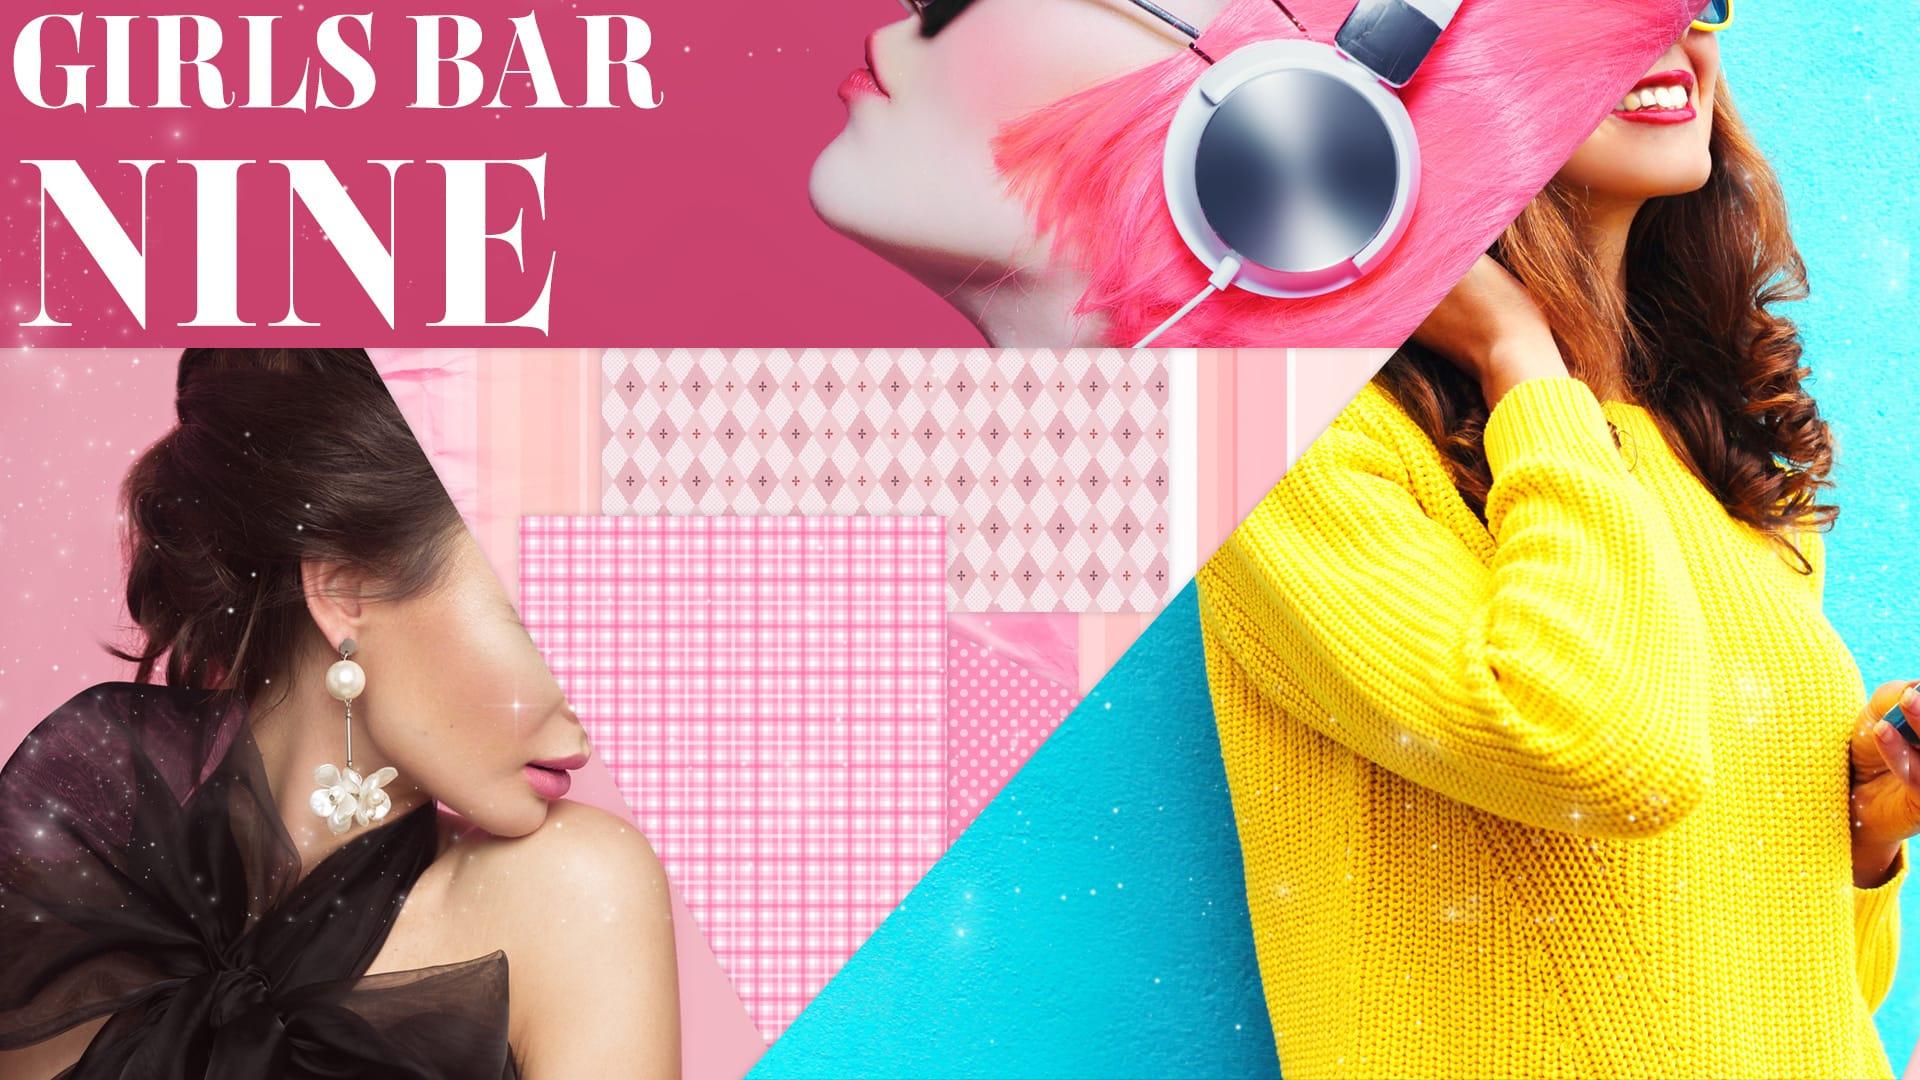 Girls bar Nine9(ナイン) 大宮ガールズバー TOP画像